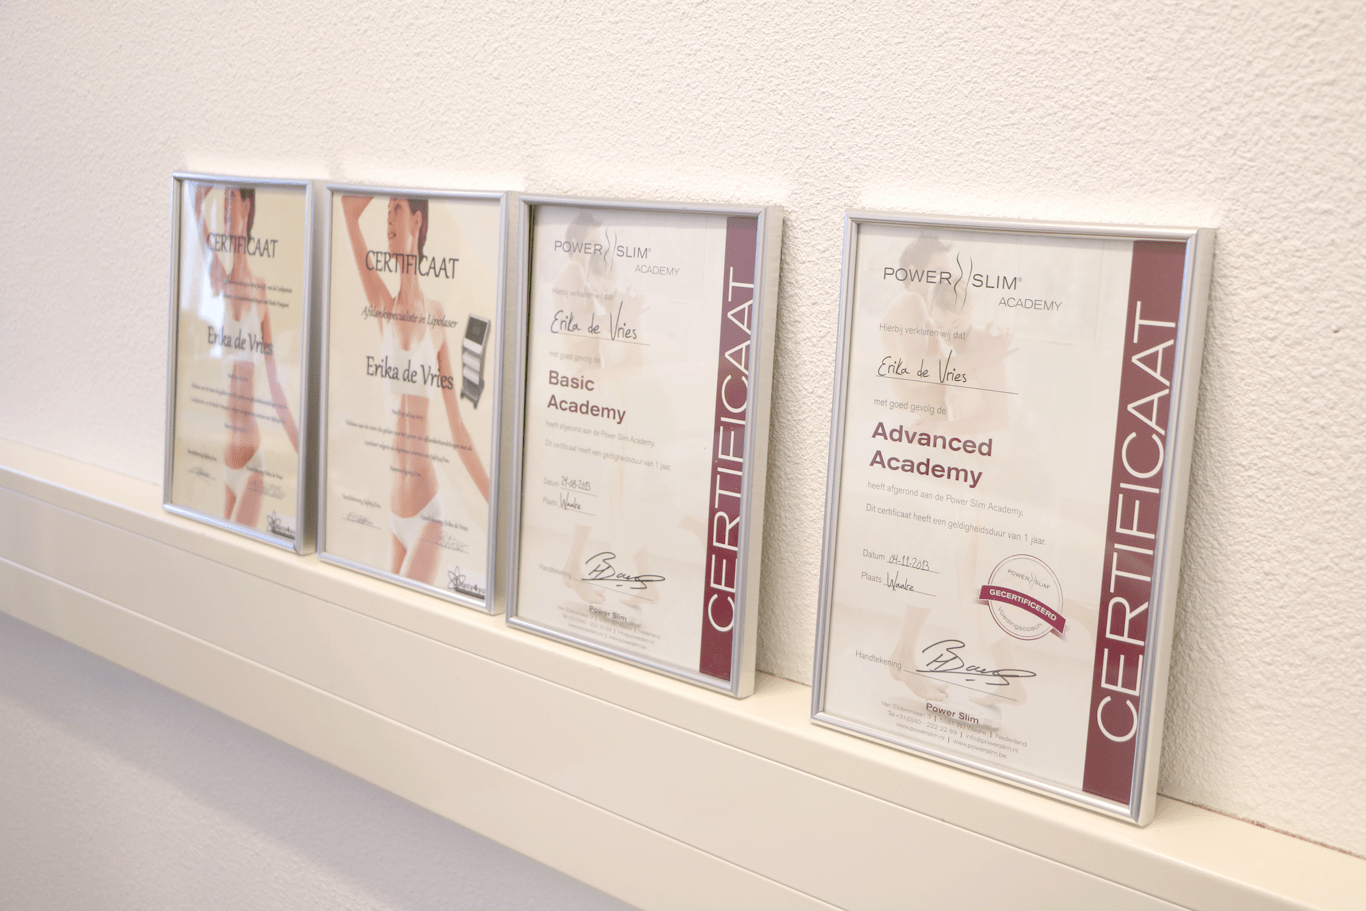 Mooie Certificates